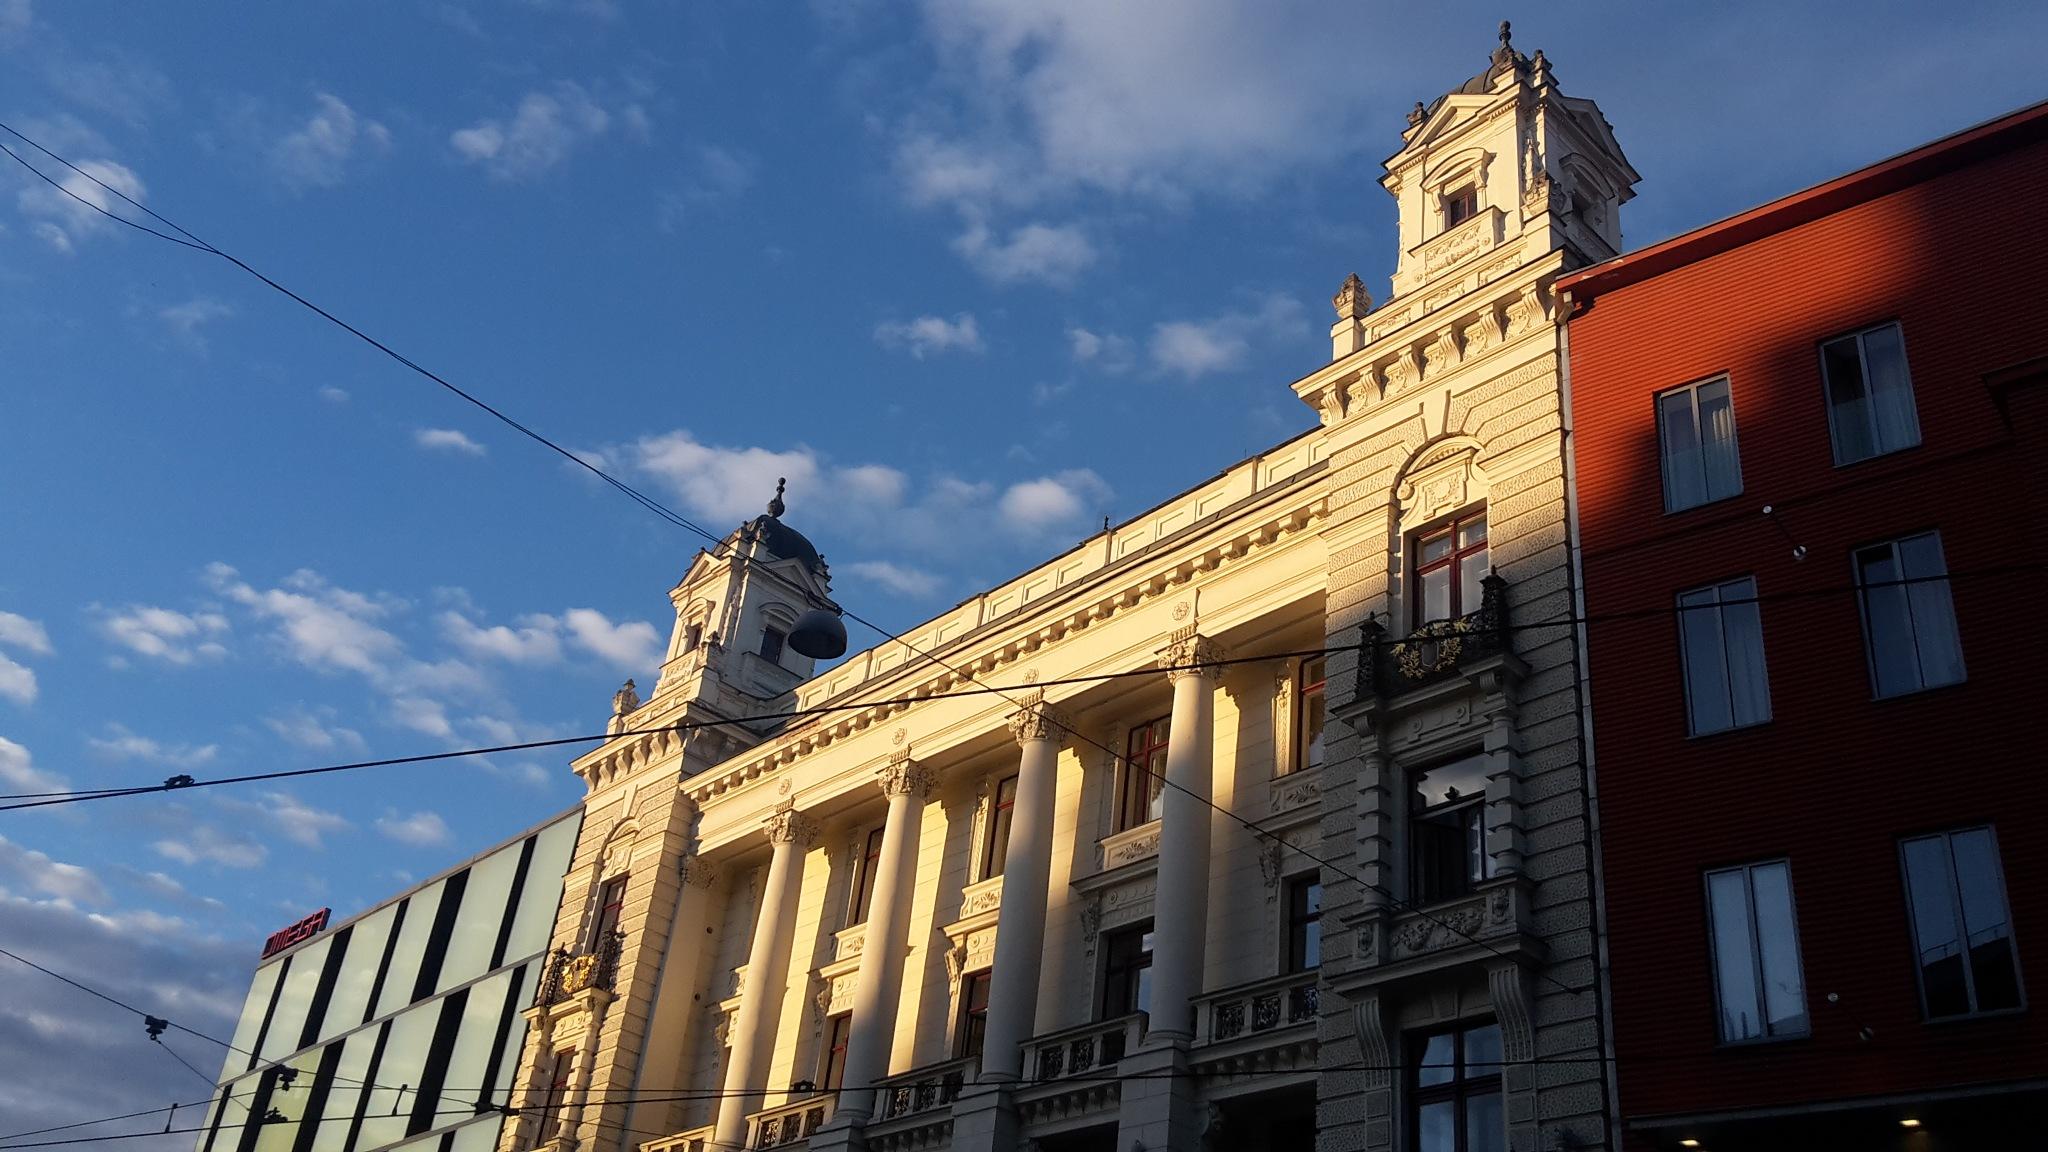 Brno city by  robert pojedinec robert